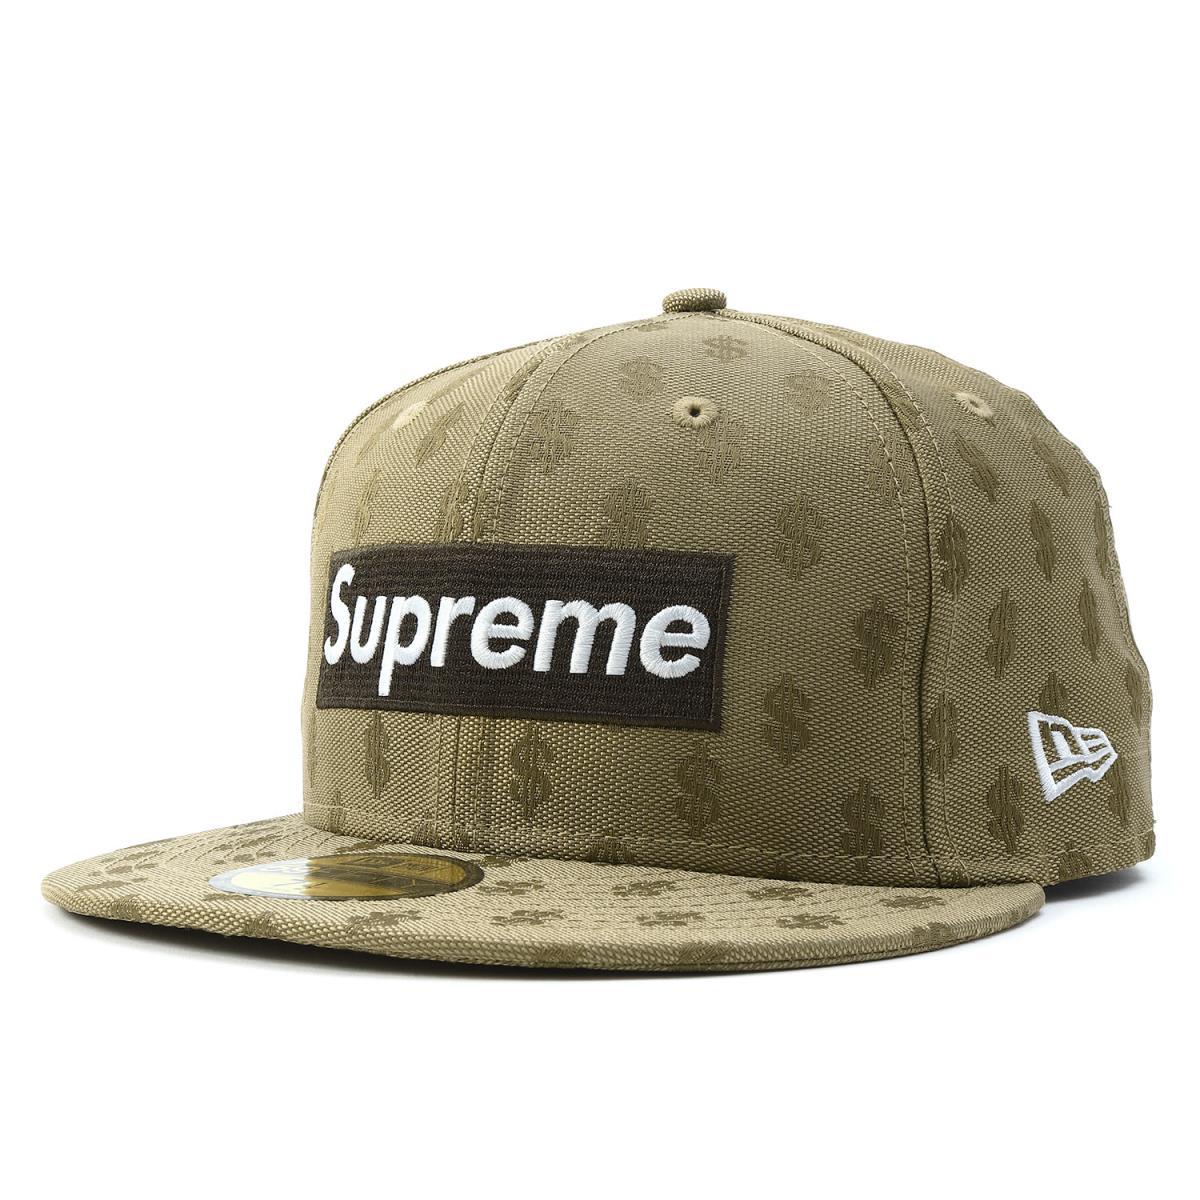 Supreme (シュプリーム) 18S S X NEW ERA BOX logo monogram baseball cap (Monogram  Box Logo) brown 7 1 2(59.6cm) 260289586c85